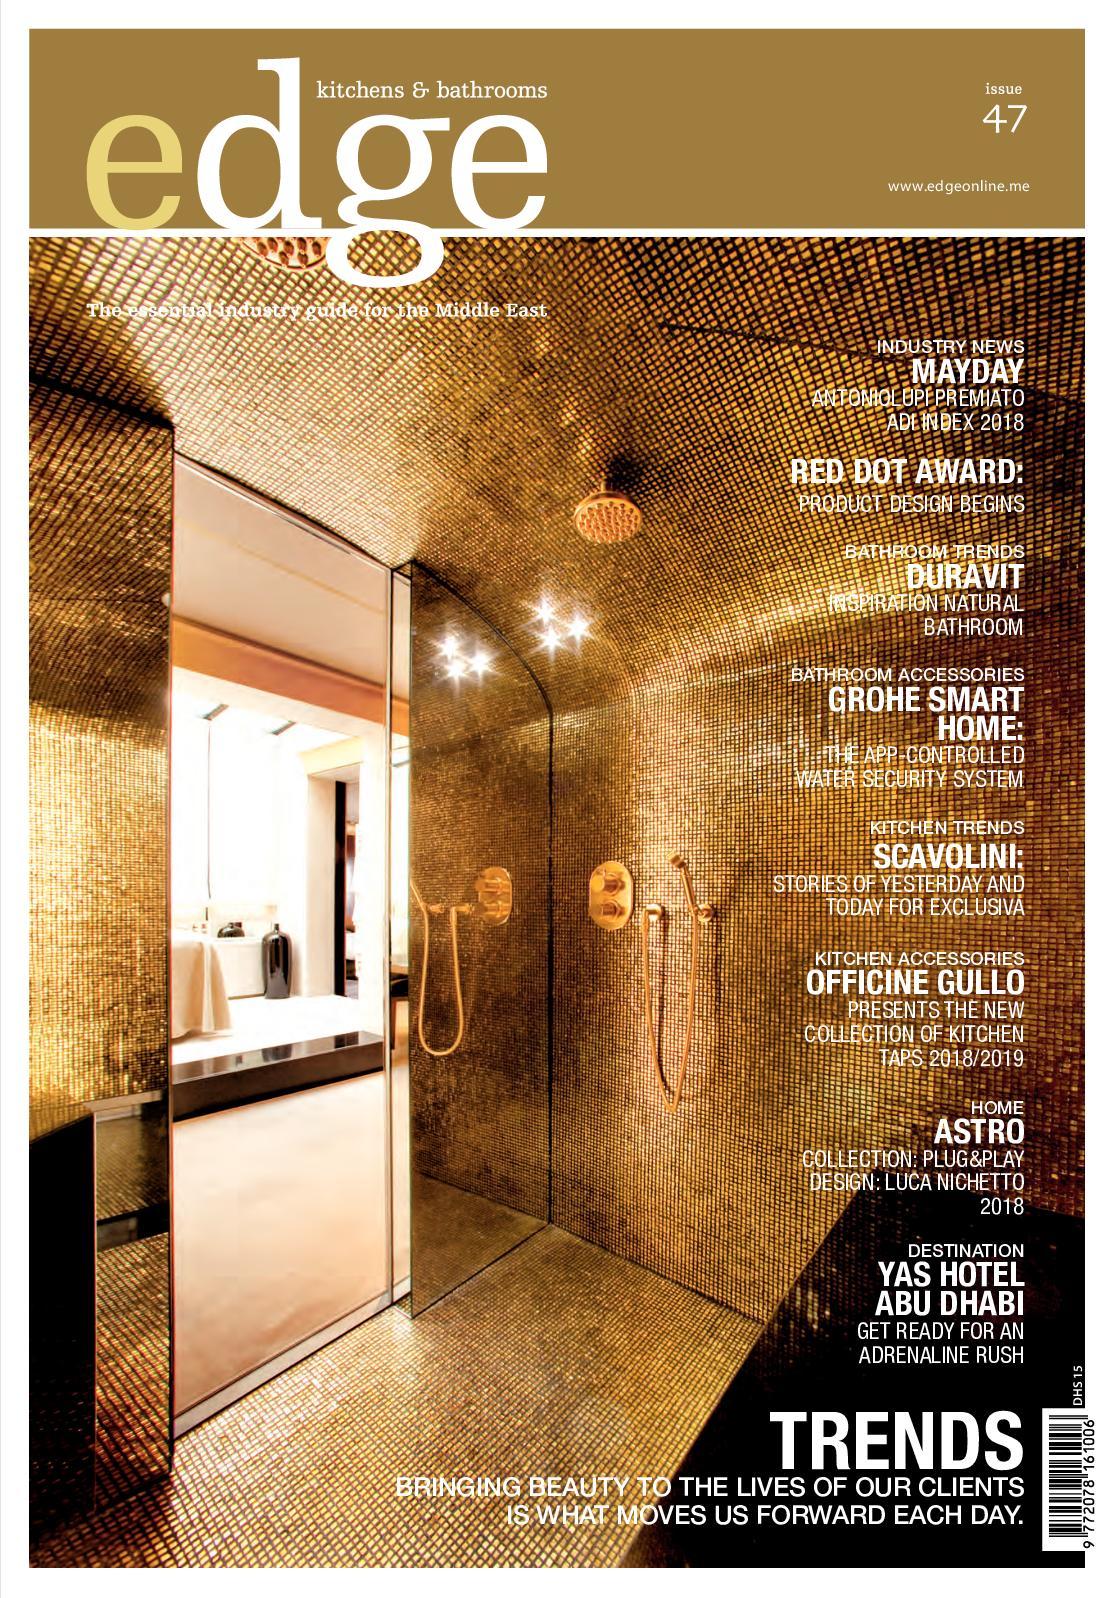 Calameo Edge Issue47 Nov Jan 2018 Gcc - Brillante-glass-vanity-by-antonio-lupi